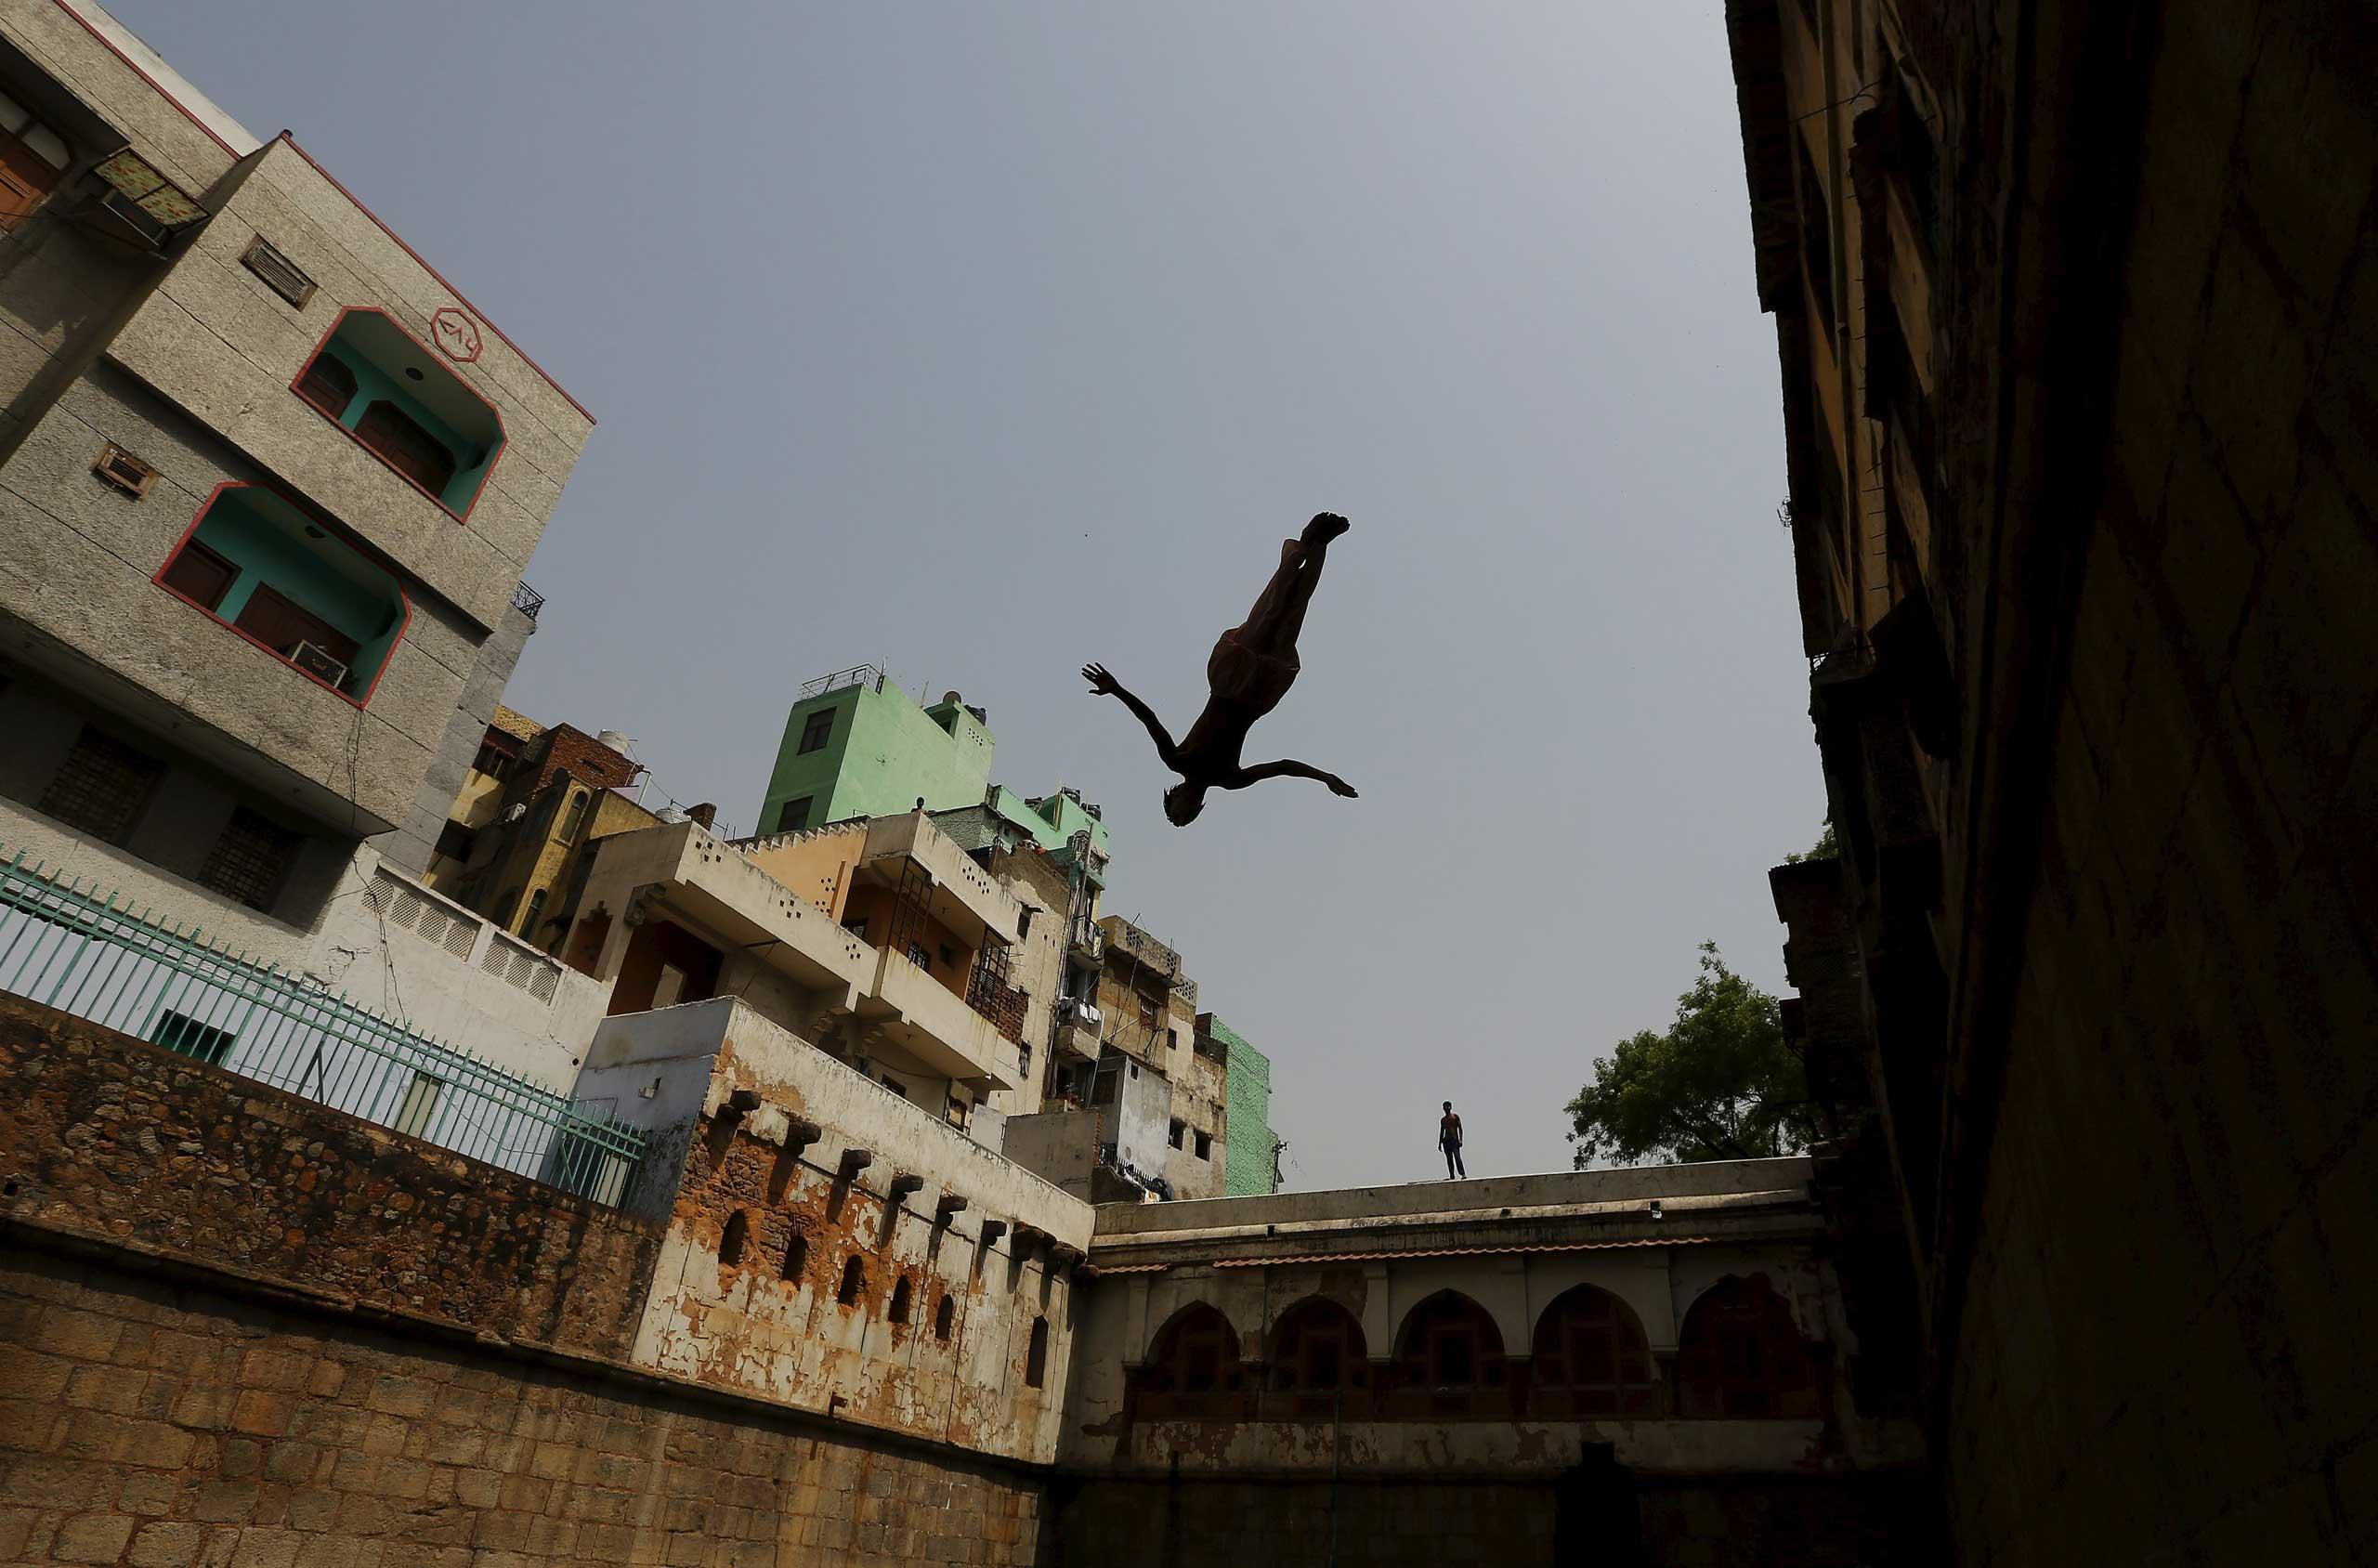 A boy jumps into a step well built inside the shrine of Sufi Saint Nizamuddin Auliya in New Delhi on May 24, 2015.